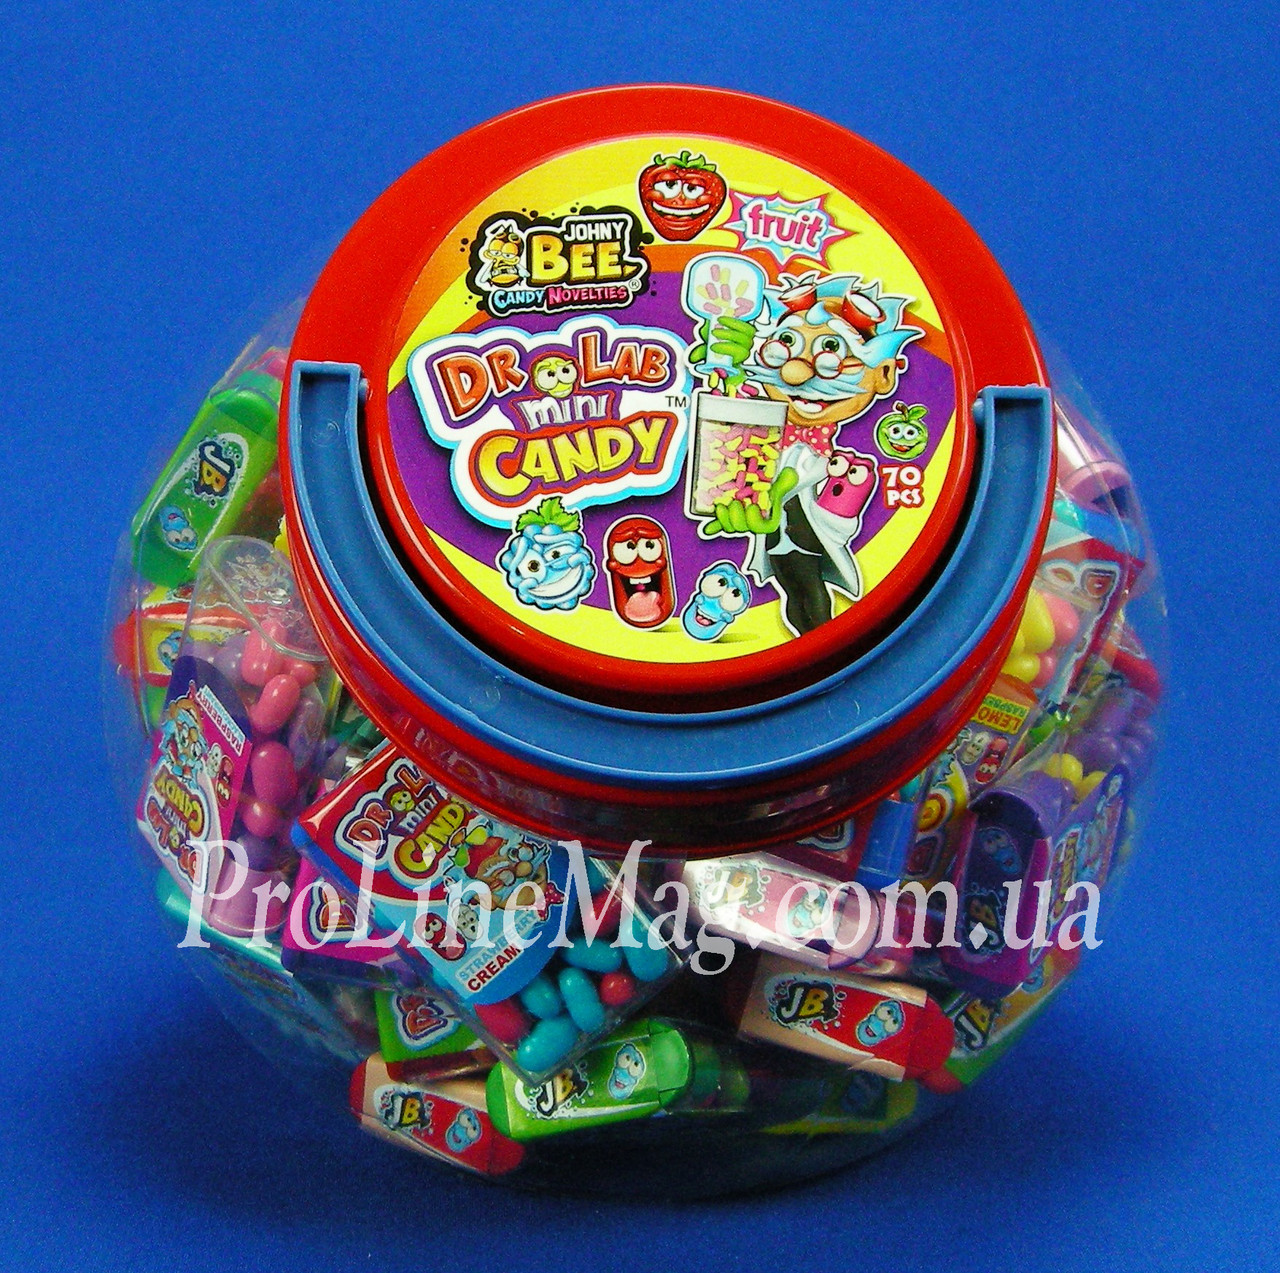 Конфеты - драже JOHNY BEE® Mini Candy Soccer